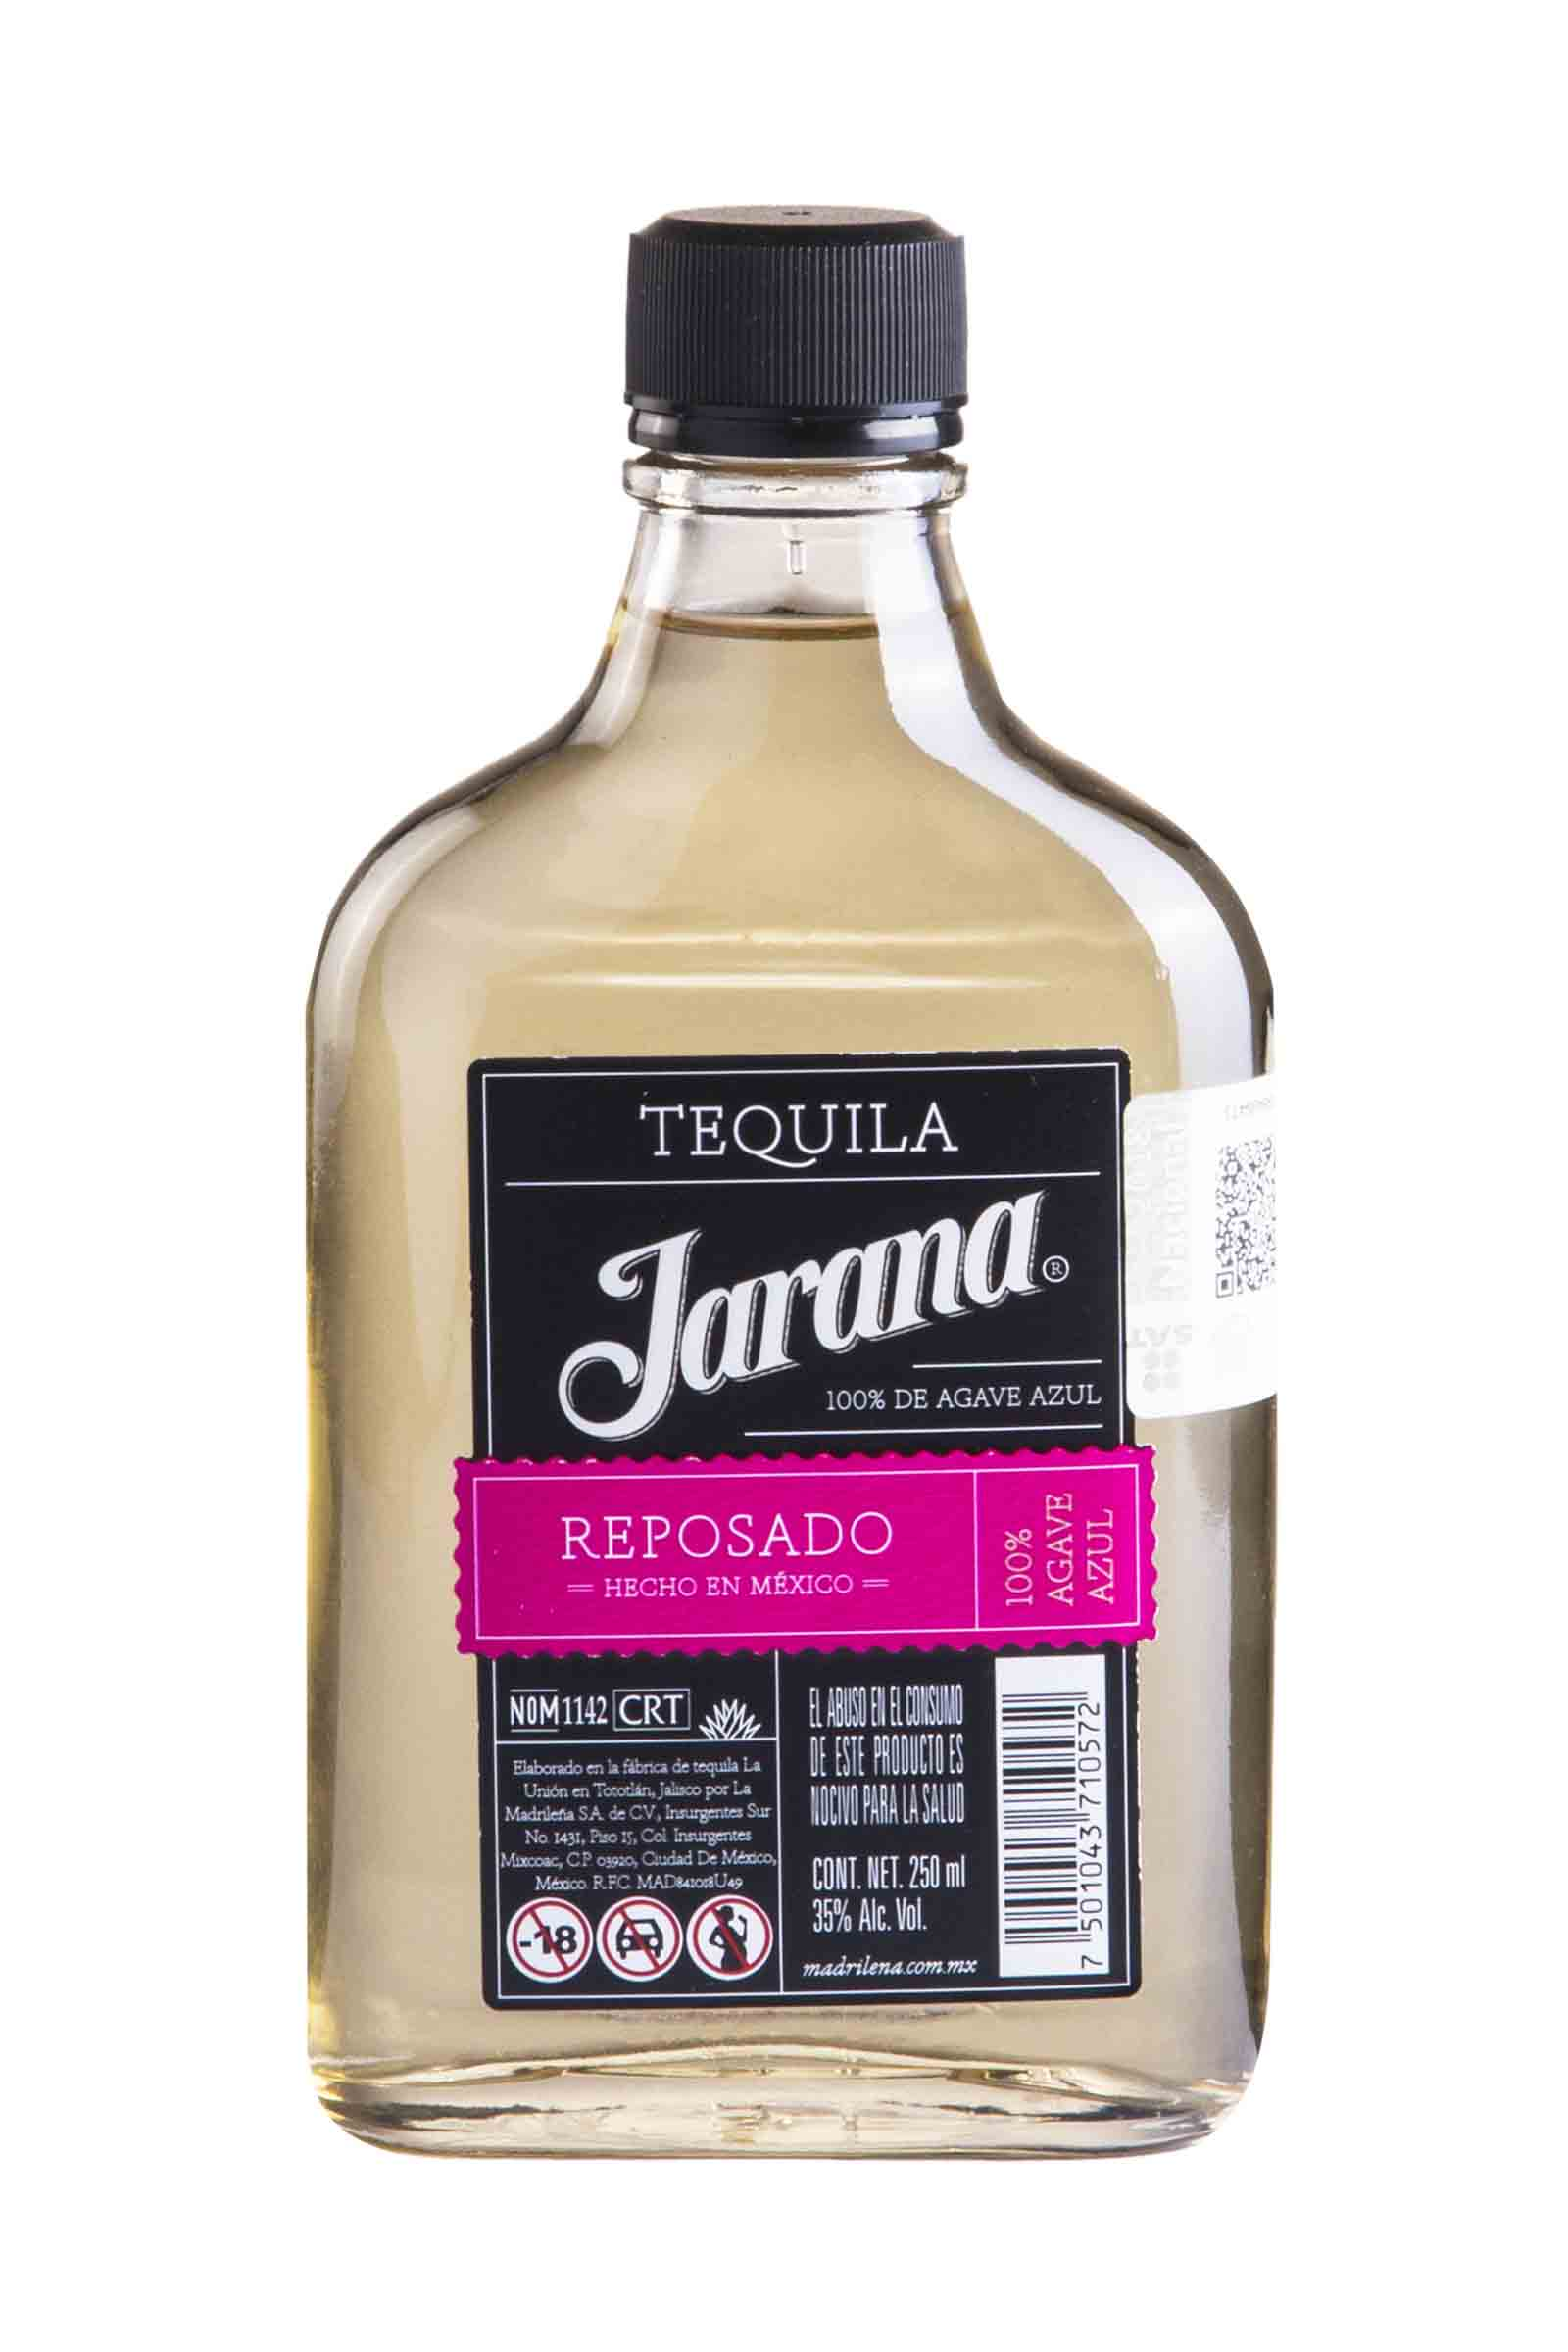 Tequila Jarana Reposado 100% Agave 250ml